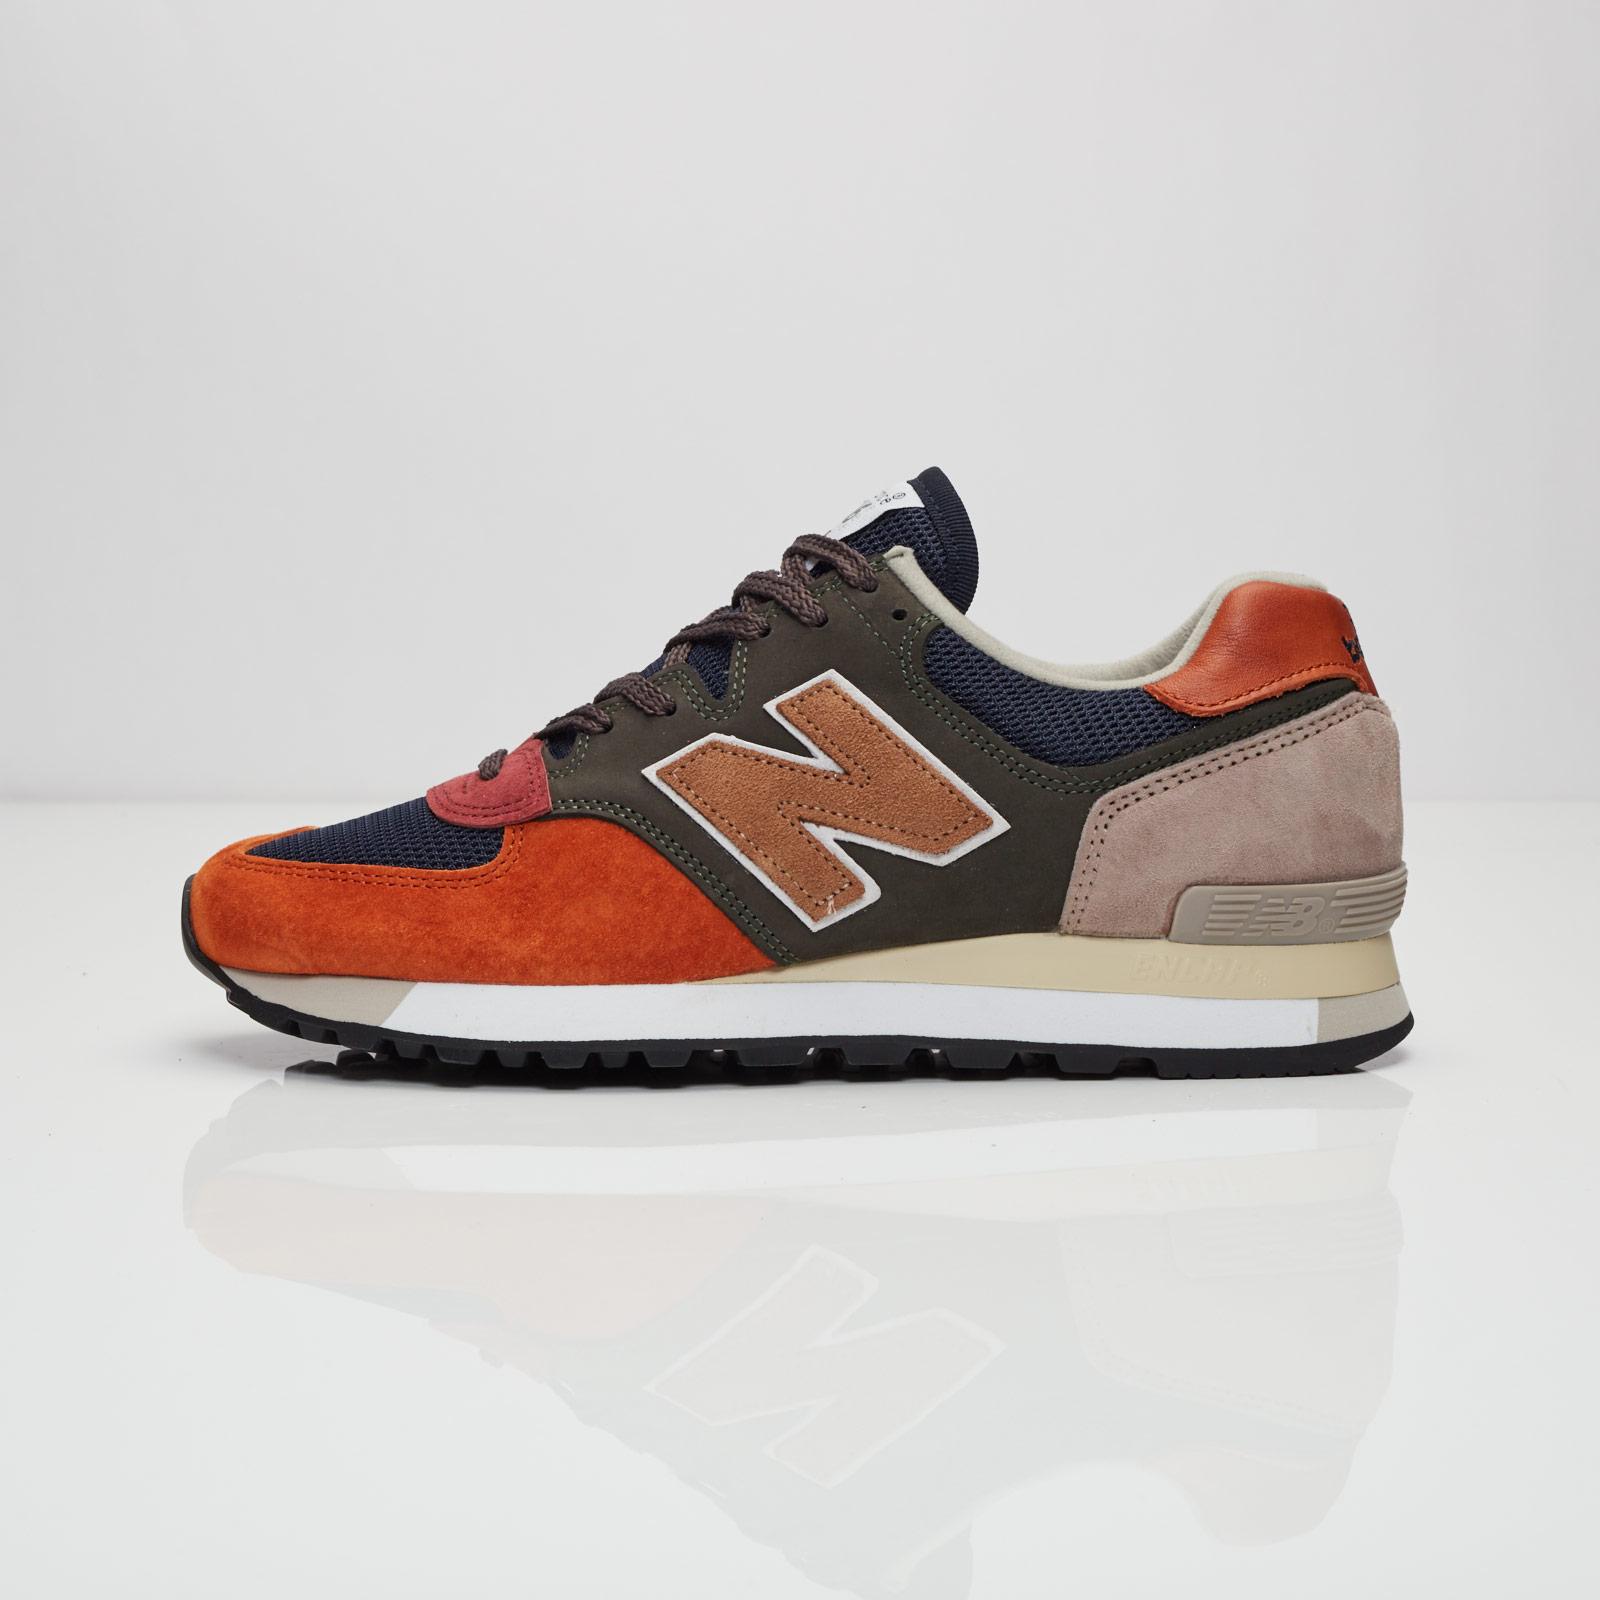 new balance m575